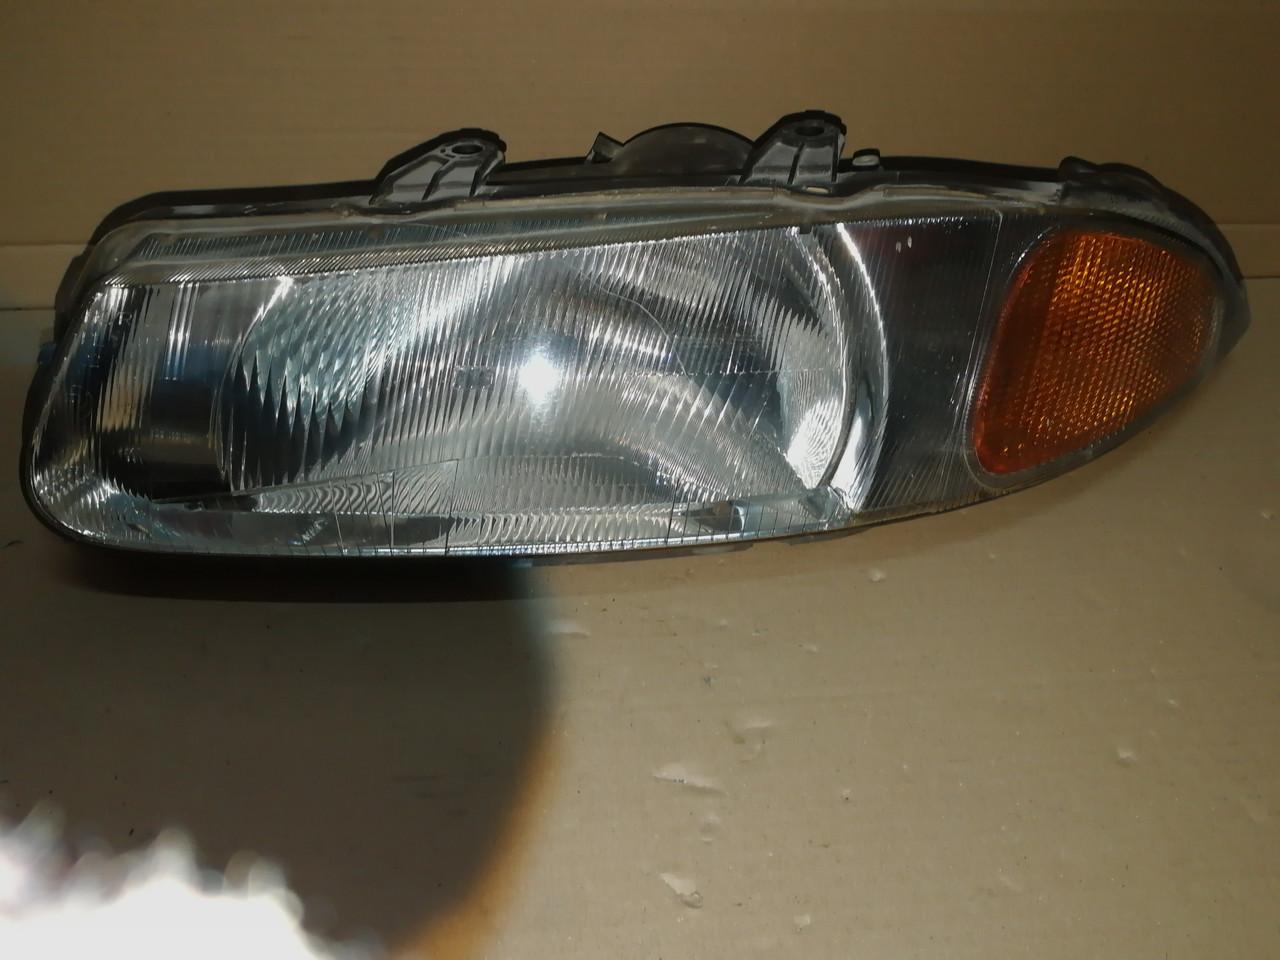 Фара передня права  Rover 214,216,220 1996г 88203078